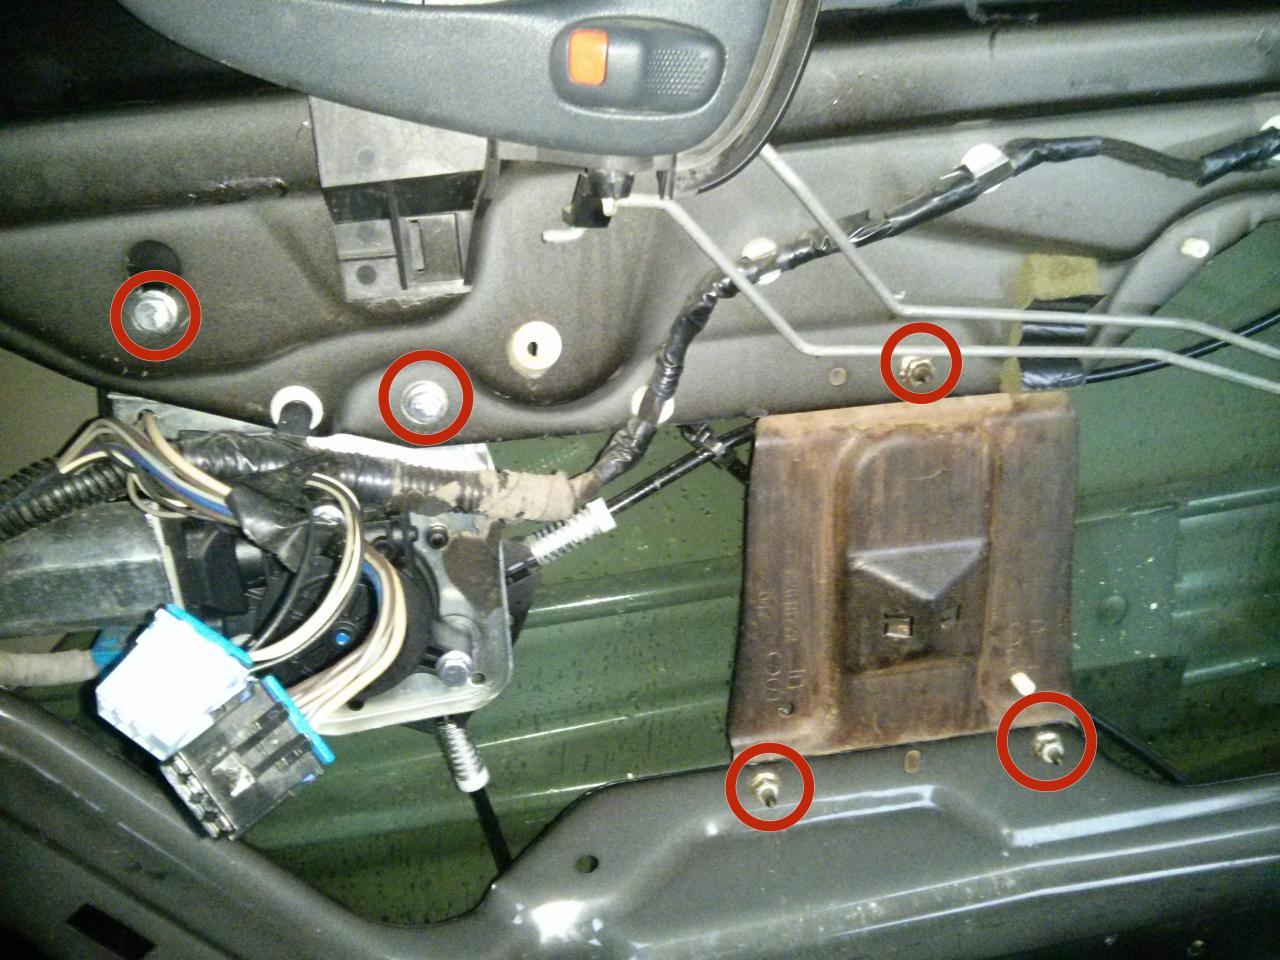 1999 2005 Pontiac Grand Am Passenger Side Window Regulator Power 2004 Grandam Motor And Assembly Rear